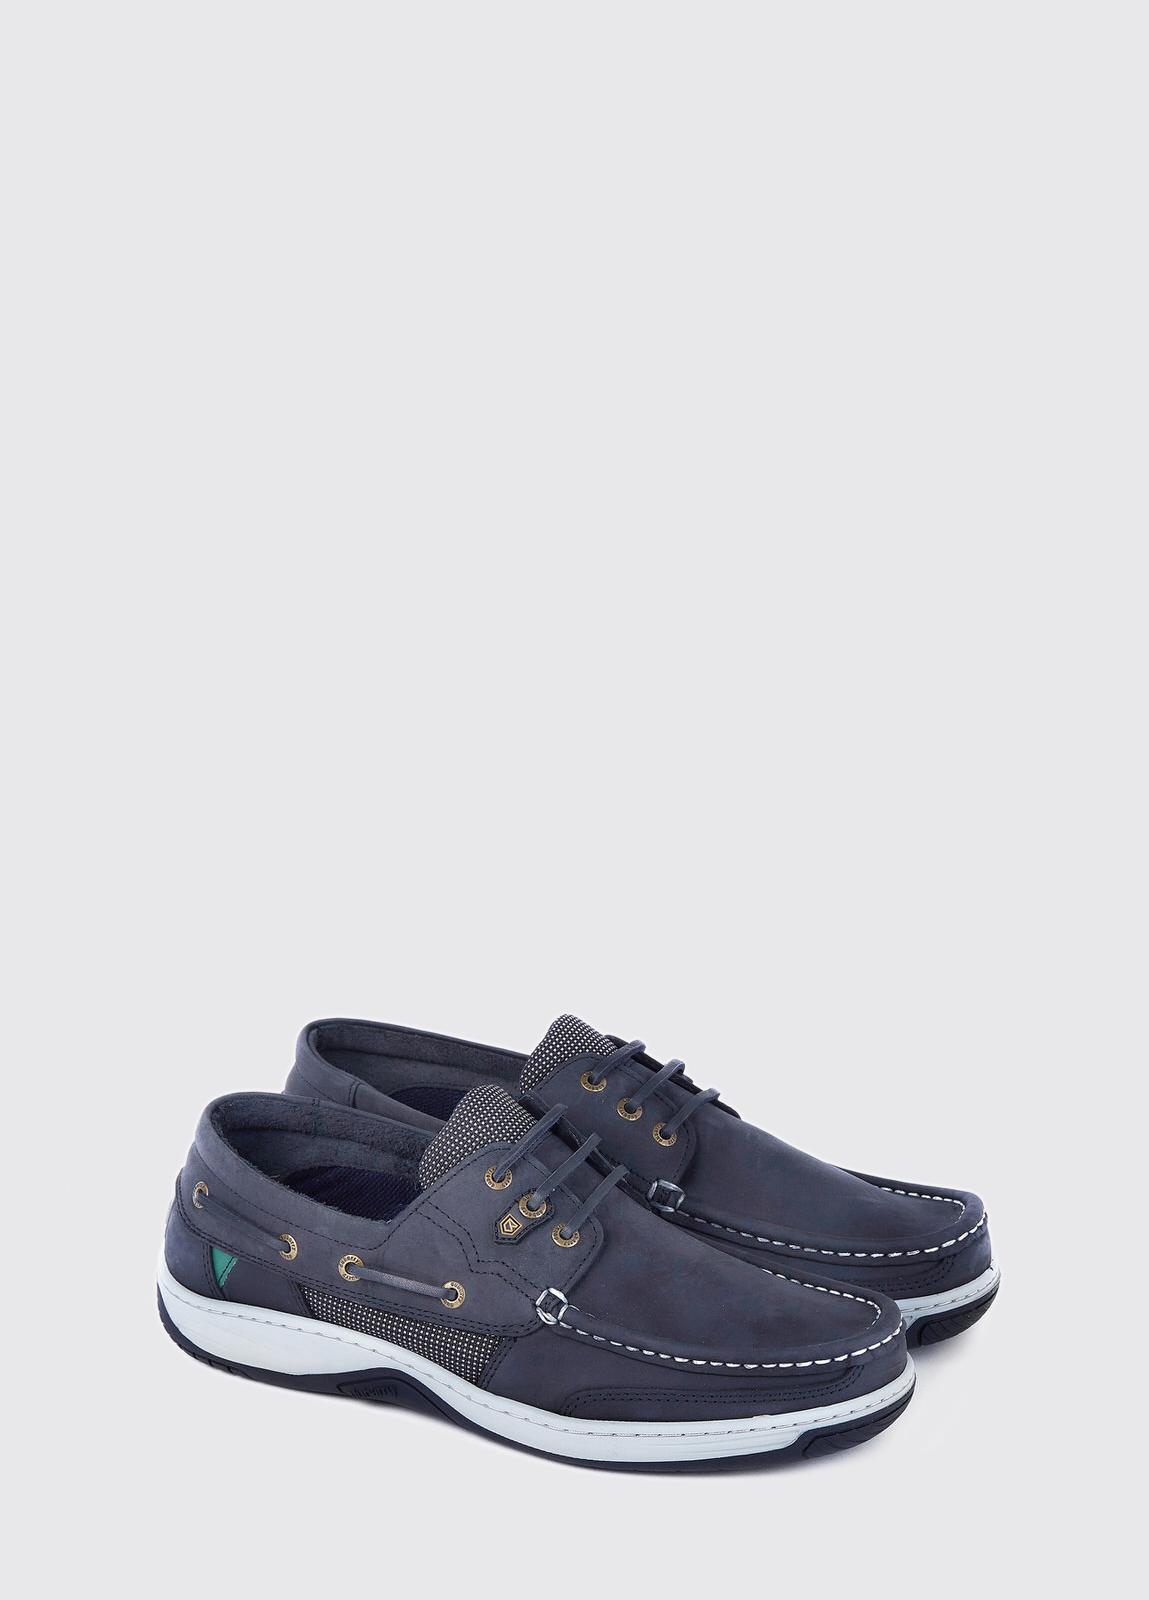 Chaussures de pont Regatta - Navy